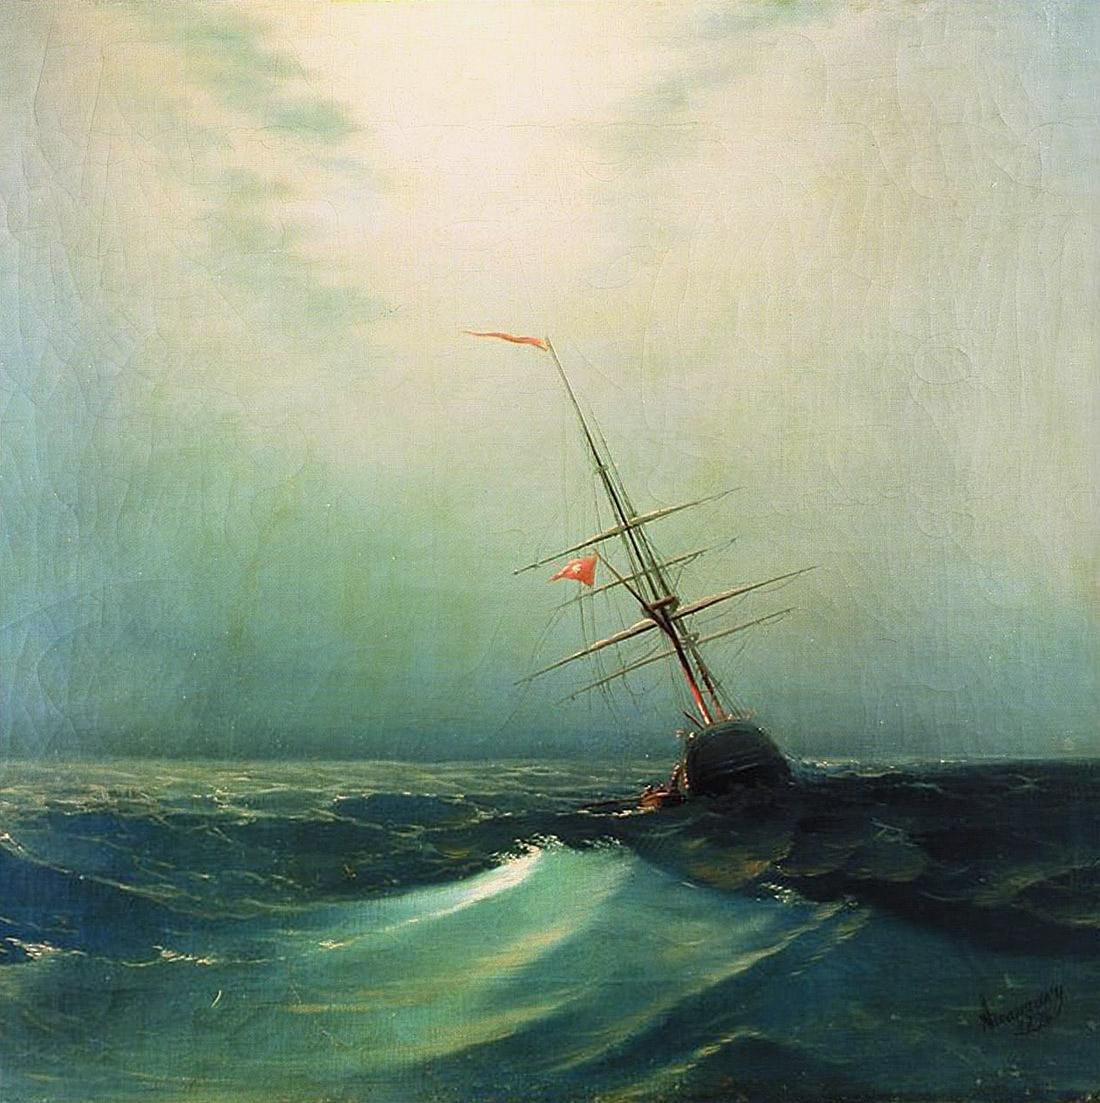 At night. Blue wave - Ivan Aivazovsky - WikiArt.org - encyclopedia of ...